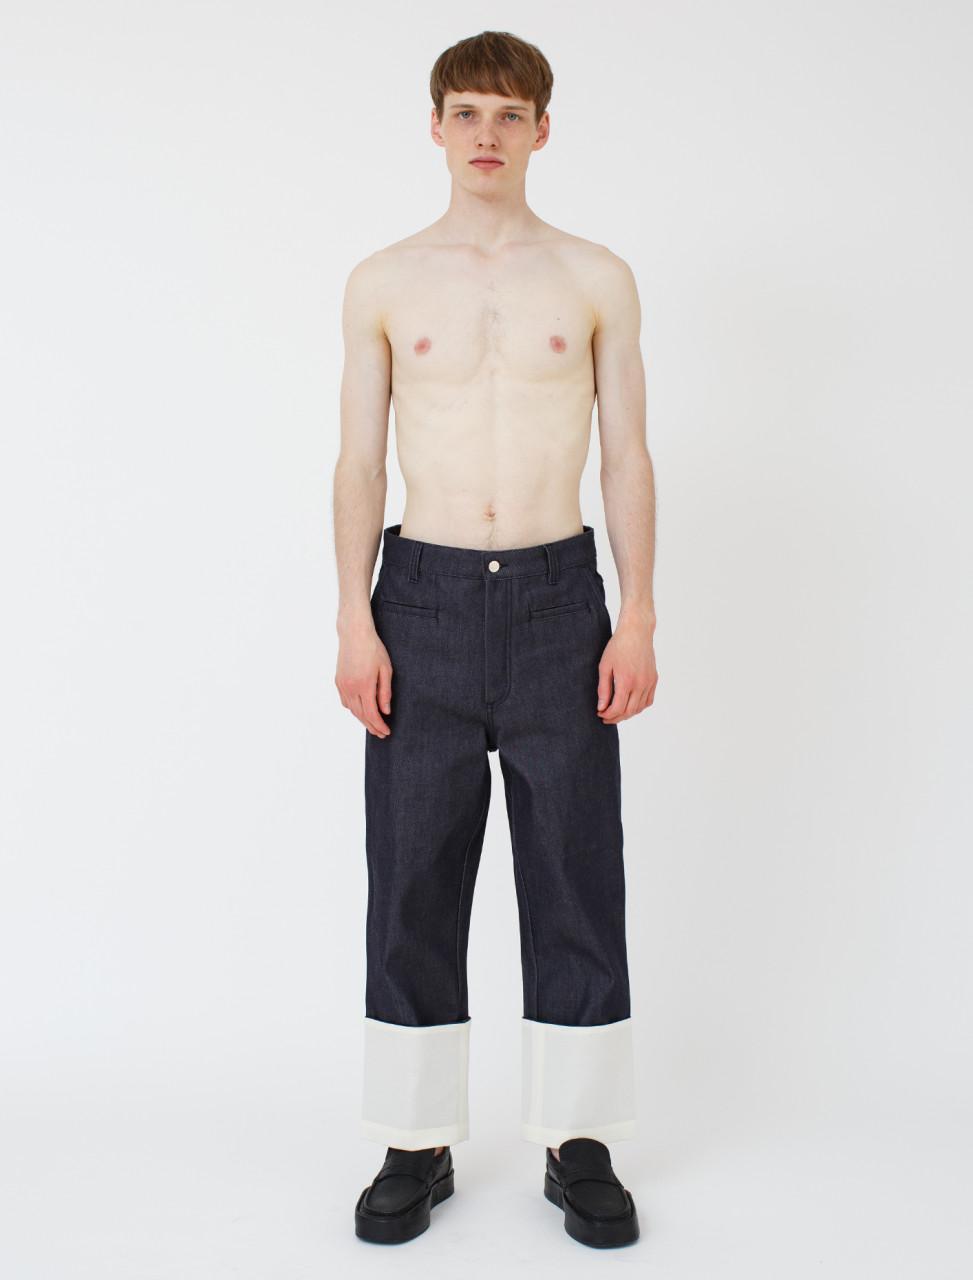 Fisherman Jeans